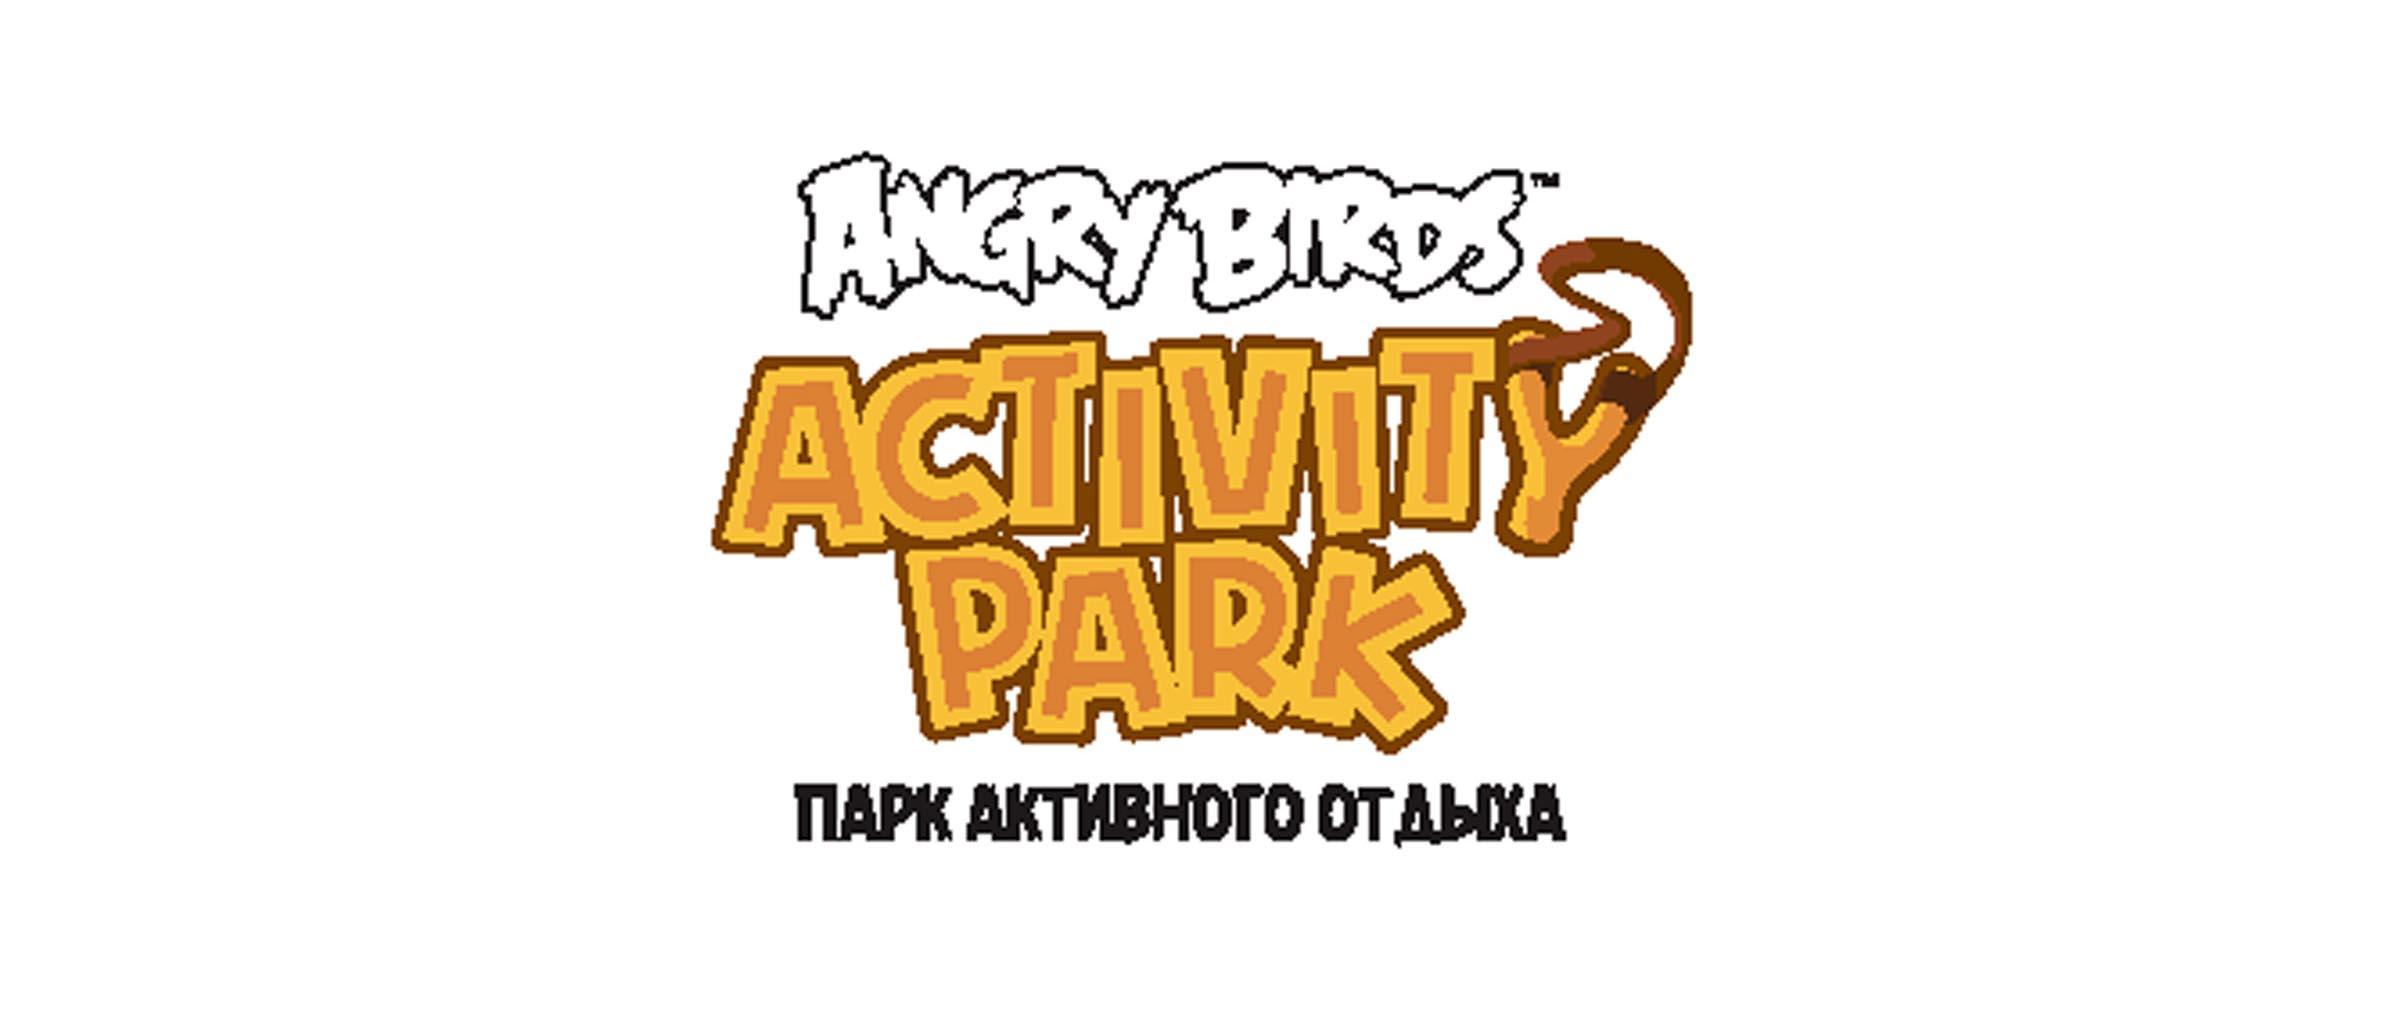 Парк активного отдыха «Angry Birds»